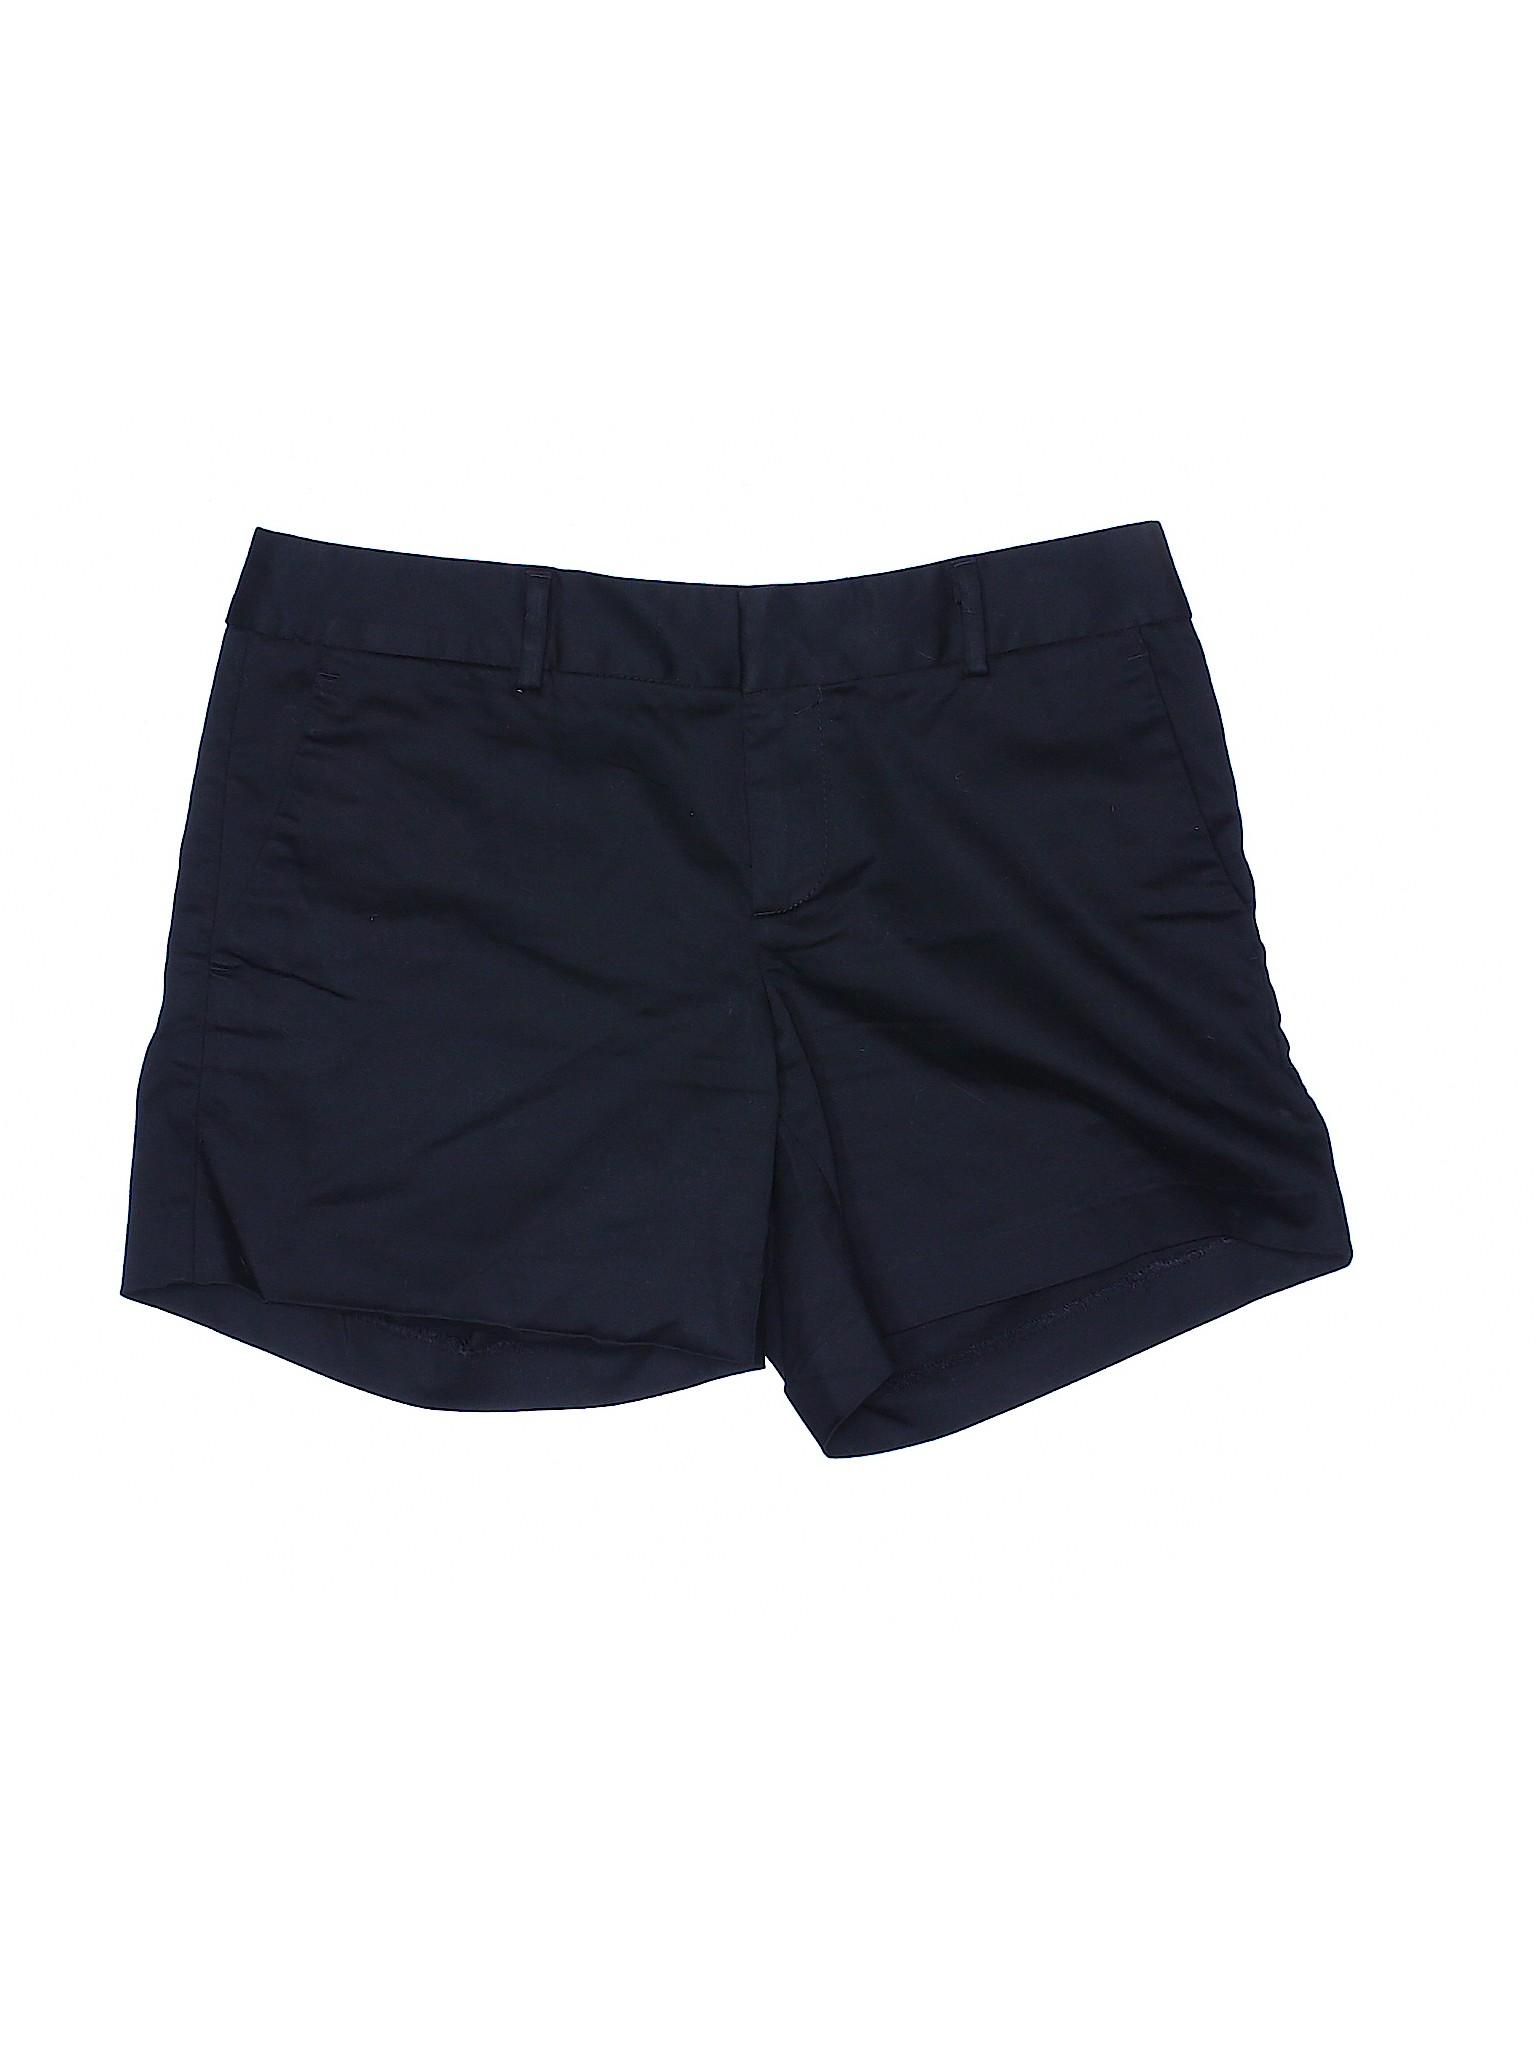 Republic winter Shorts Banana Leisure Khaki qgnzExU6